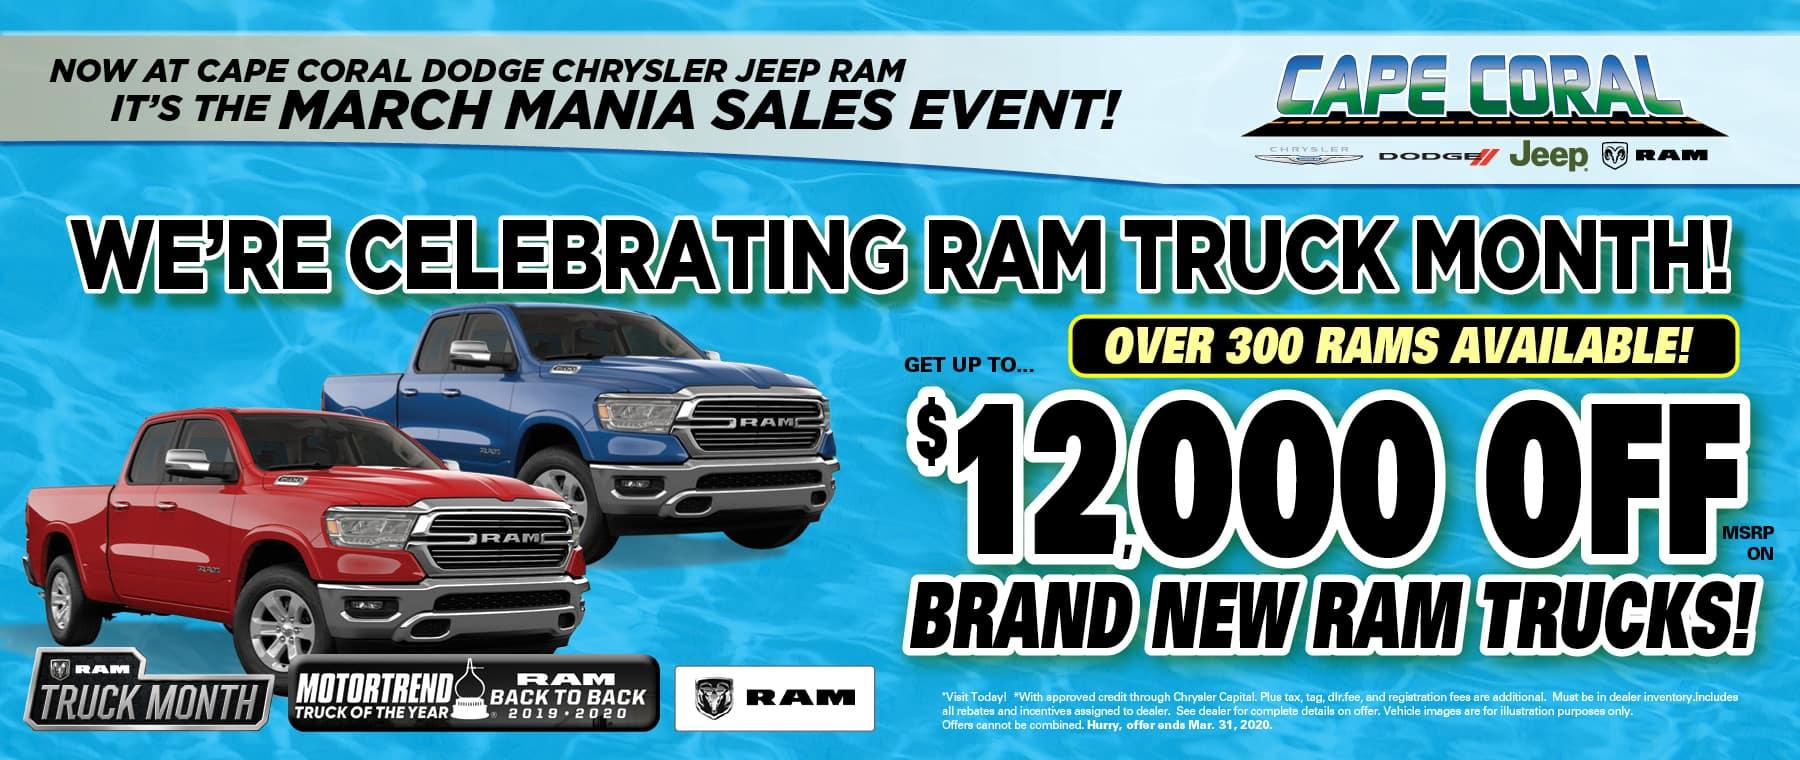 Save On New Ram Trucks!